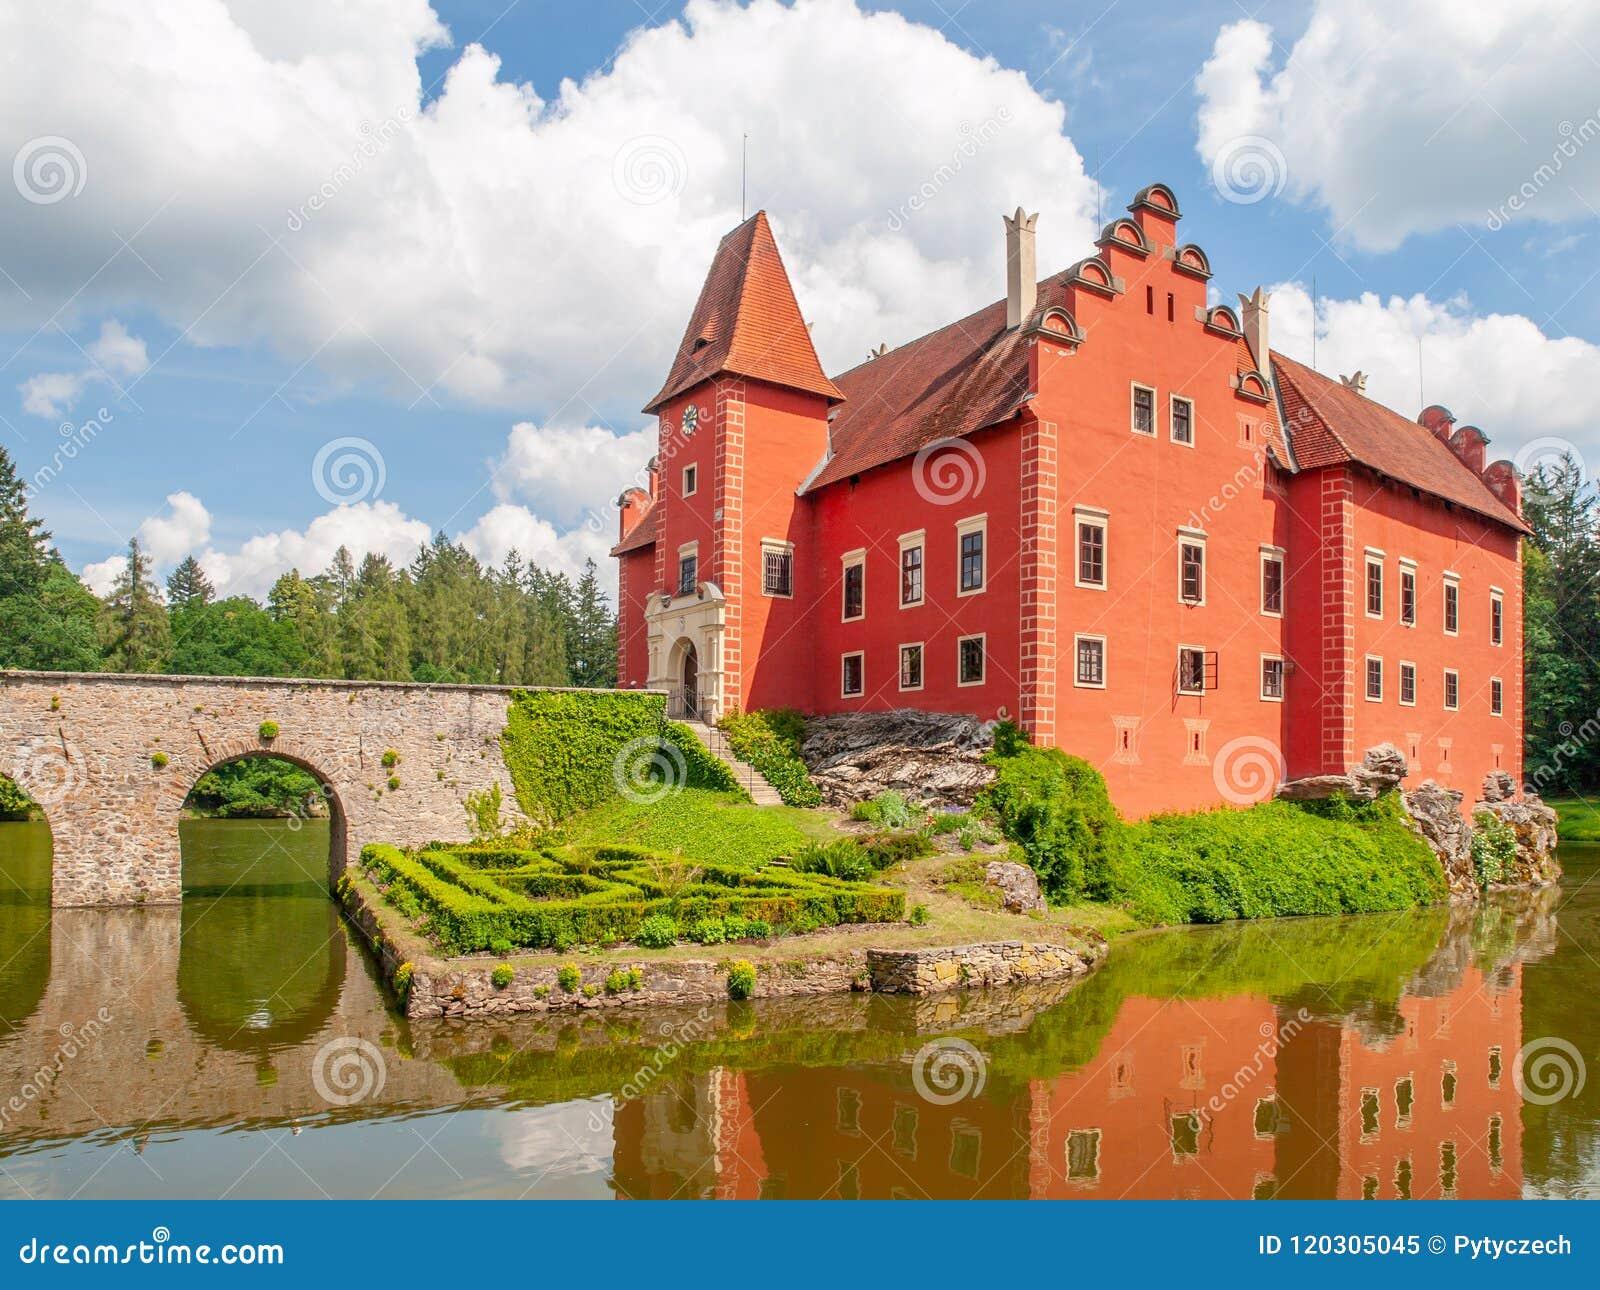 Renaissance chateau Cervena Lhota in Southern Bohemia, Czech Republic. Idyllic and picturesque fairy tale castle on the